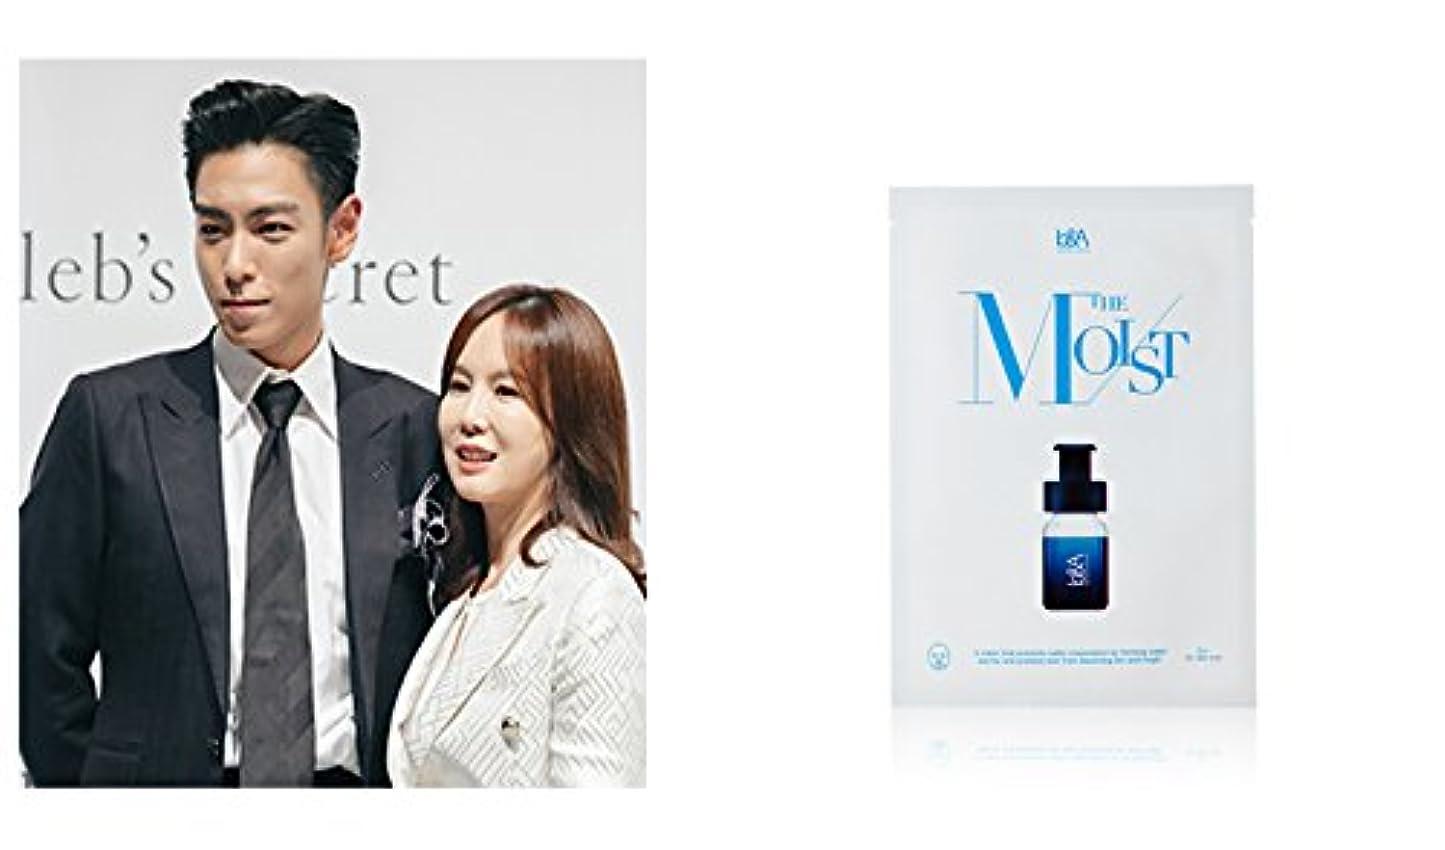 提供する悲鳴磁石BigBang Top [K cosmetic][K beauty] Celeb's-Secret THE MOIST MASK / 5pcs [海外直送品][並行輸入品]